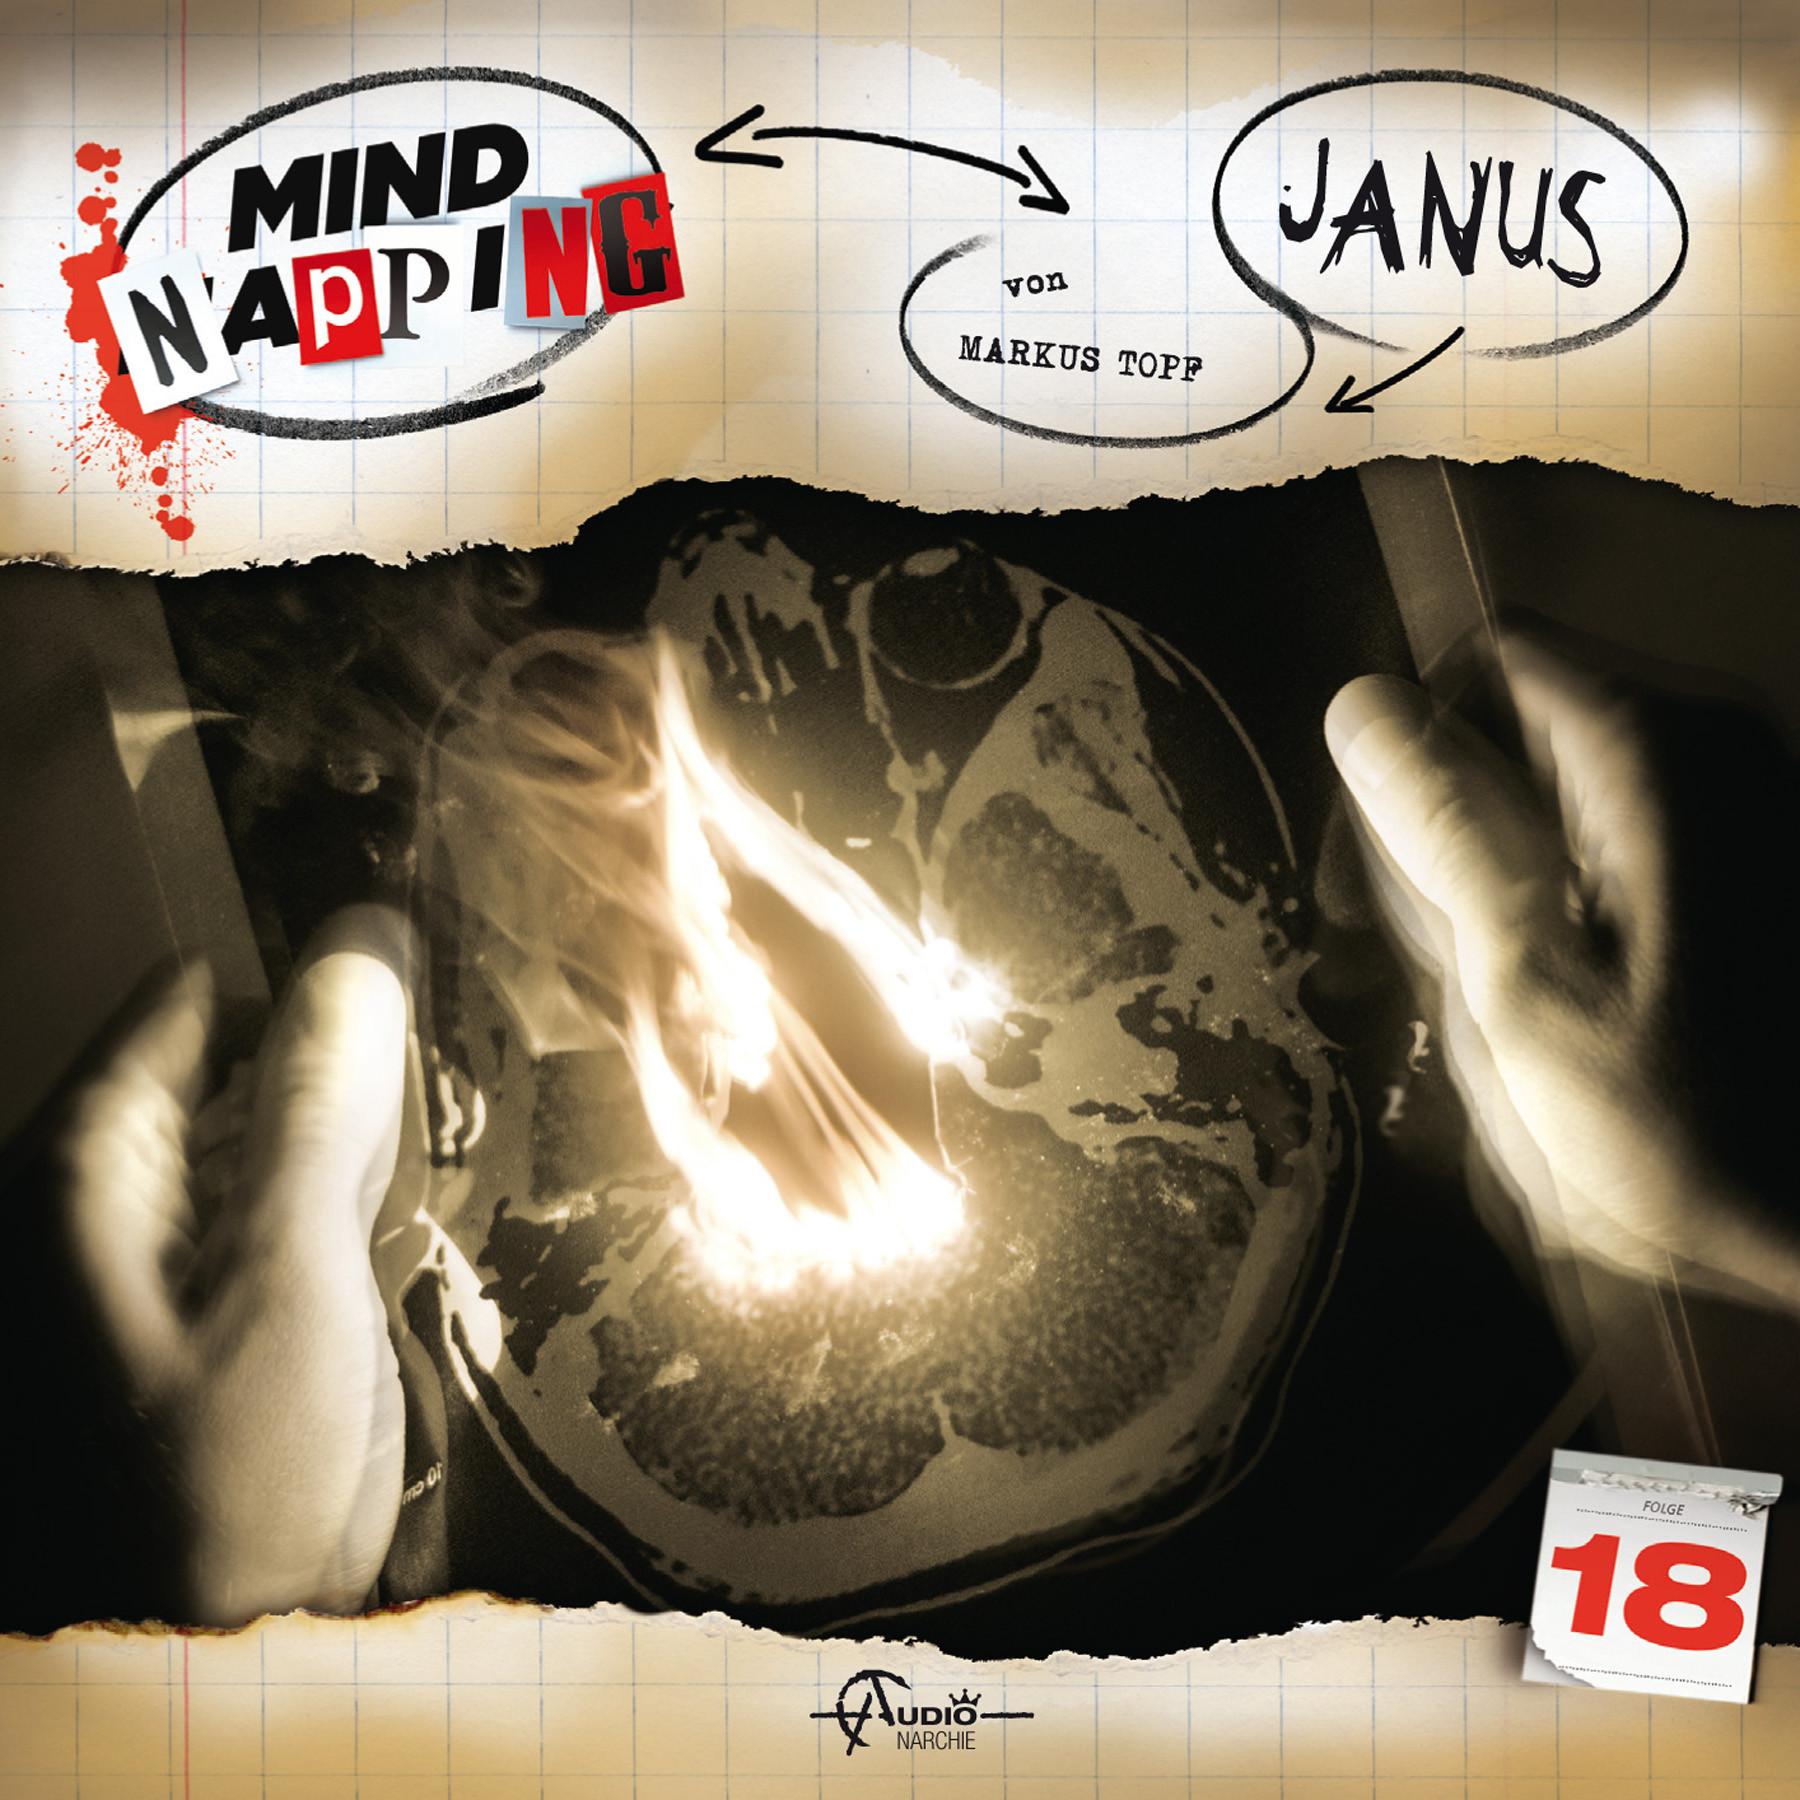 MindNapping 18 - Janus